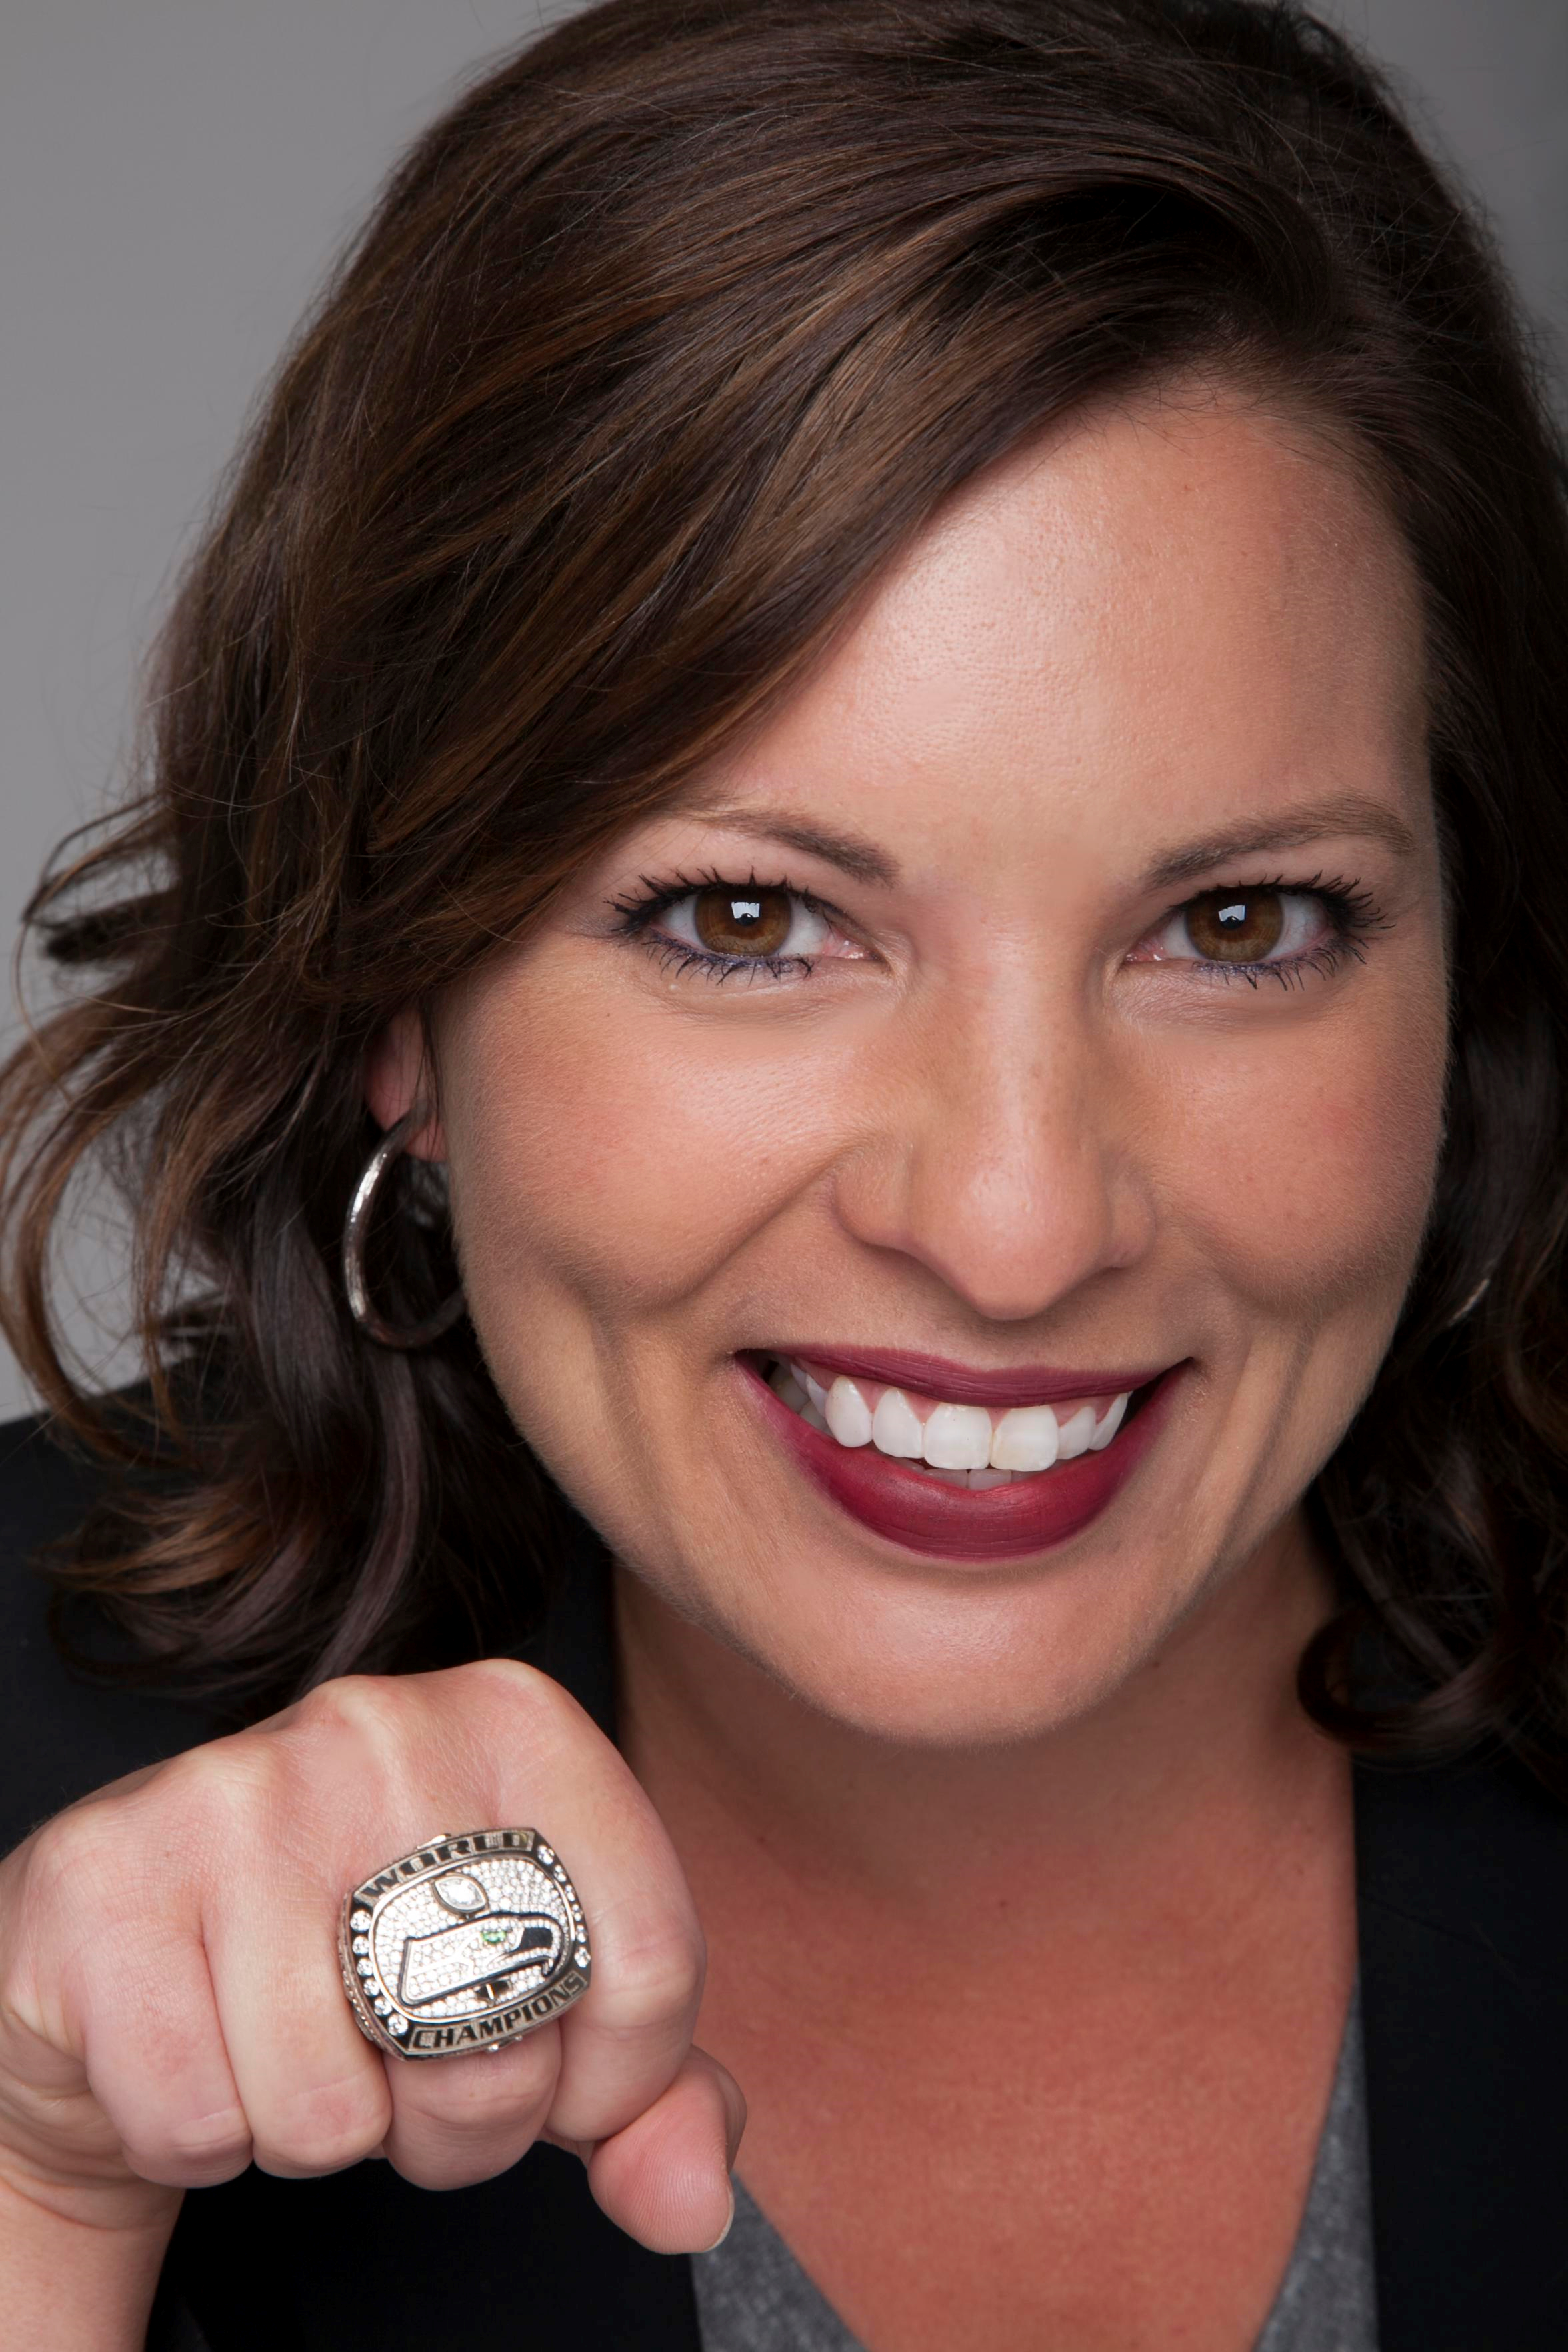 Jen Mueller - Talk Sporty to Me - how talking sports boost your career